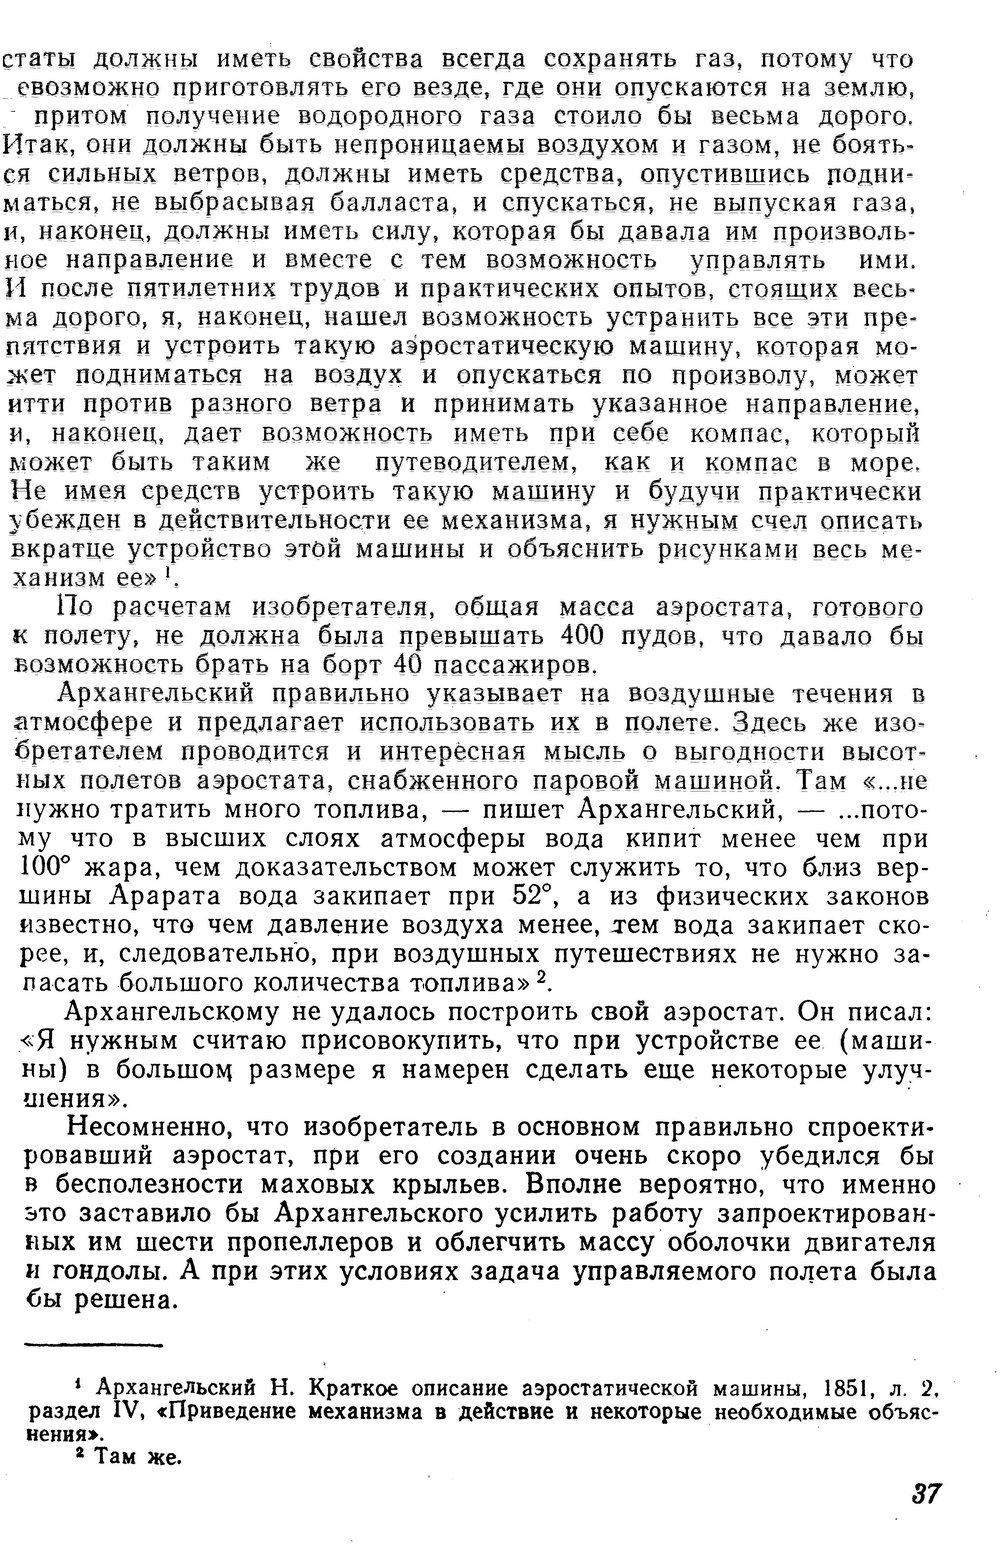 http://images.vfl.ru/ii/1367587558/39186ad8/2270400.jpg